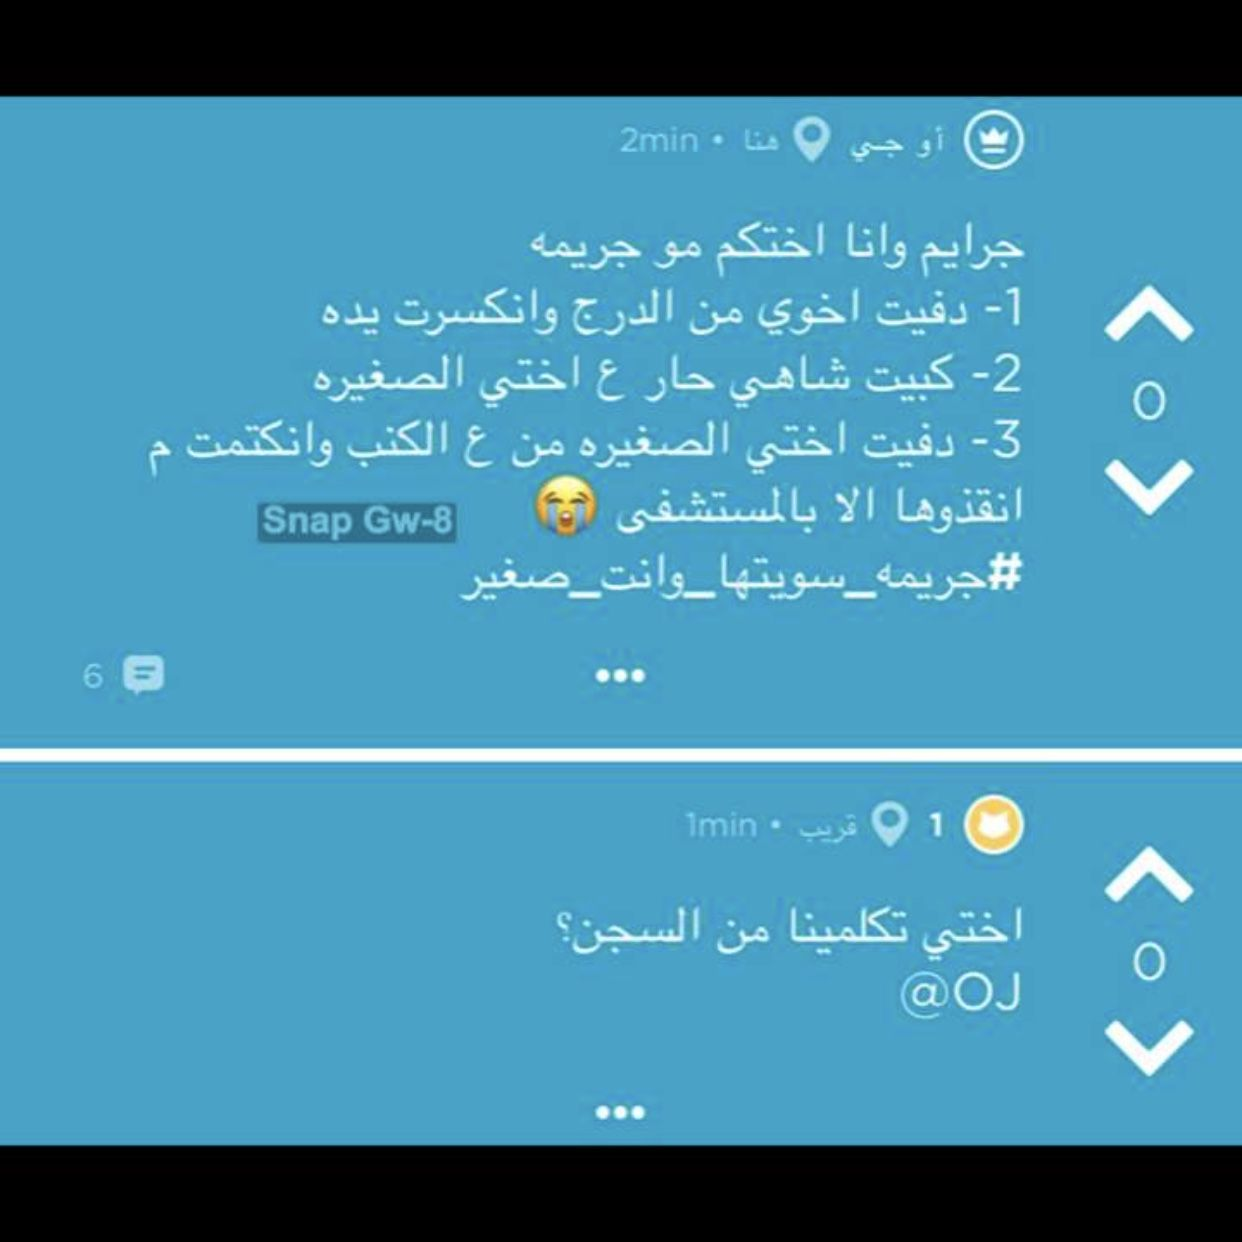 Pin By Arjawan On نكت Jokes Quotes Funny Arabic Quotes Arabic Funny